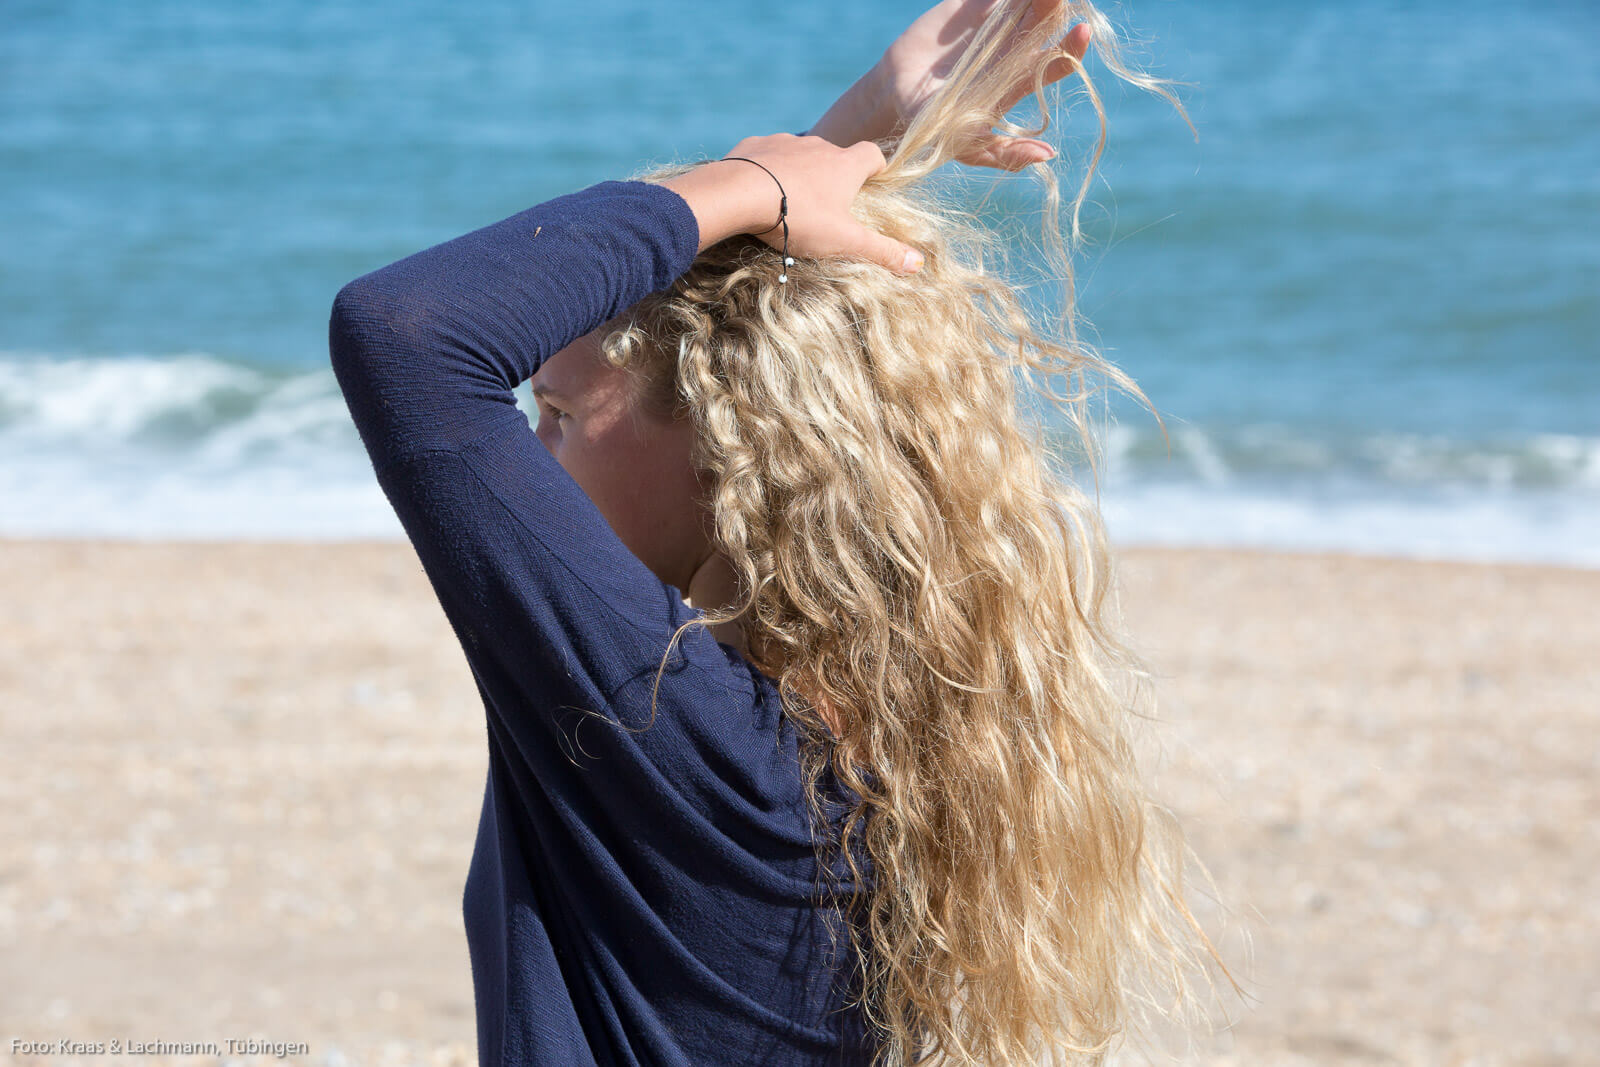 In die glatten Haare kommt wieder Schwung: Volumen ist angesagt bei den Frisurentrends 2017